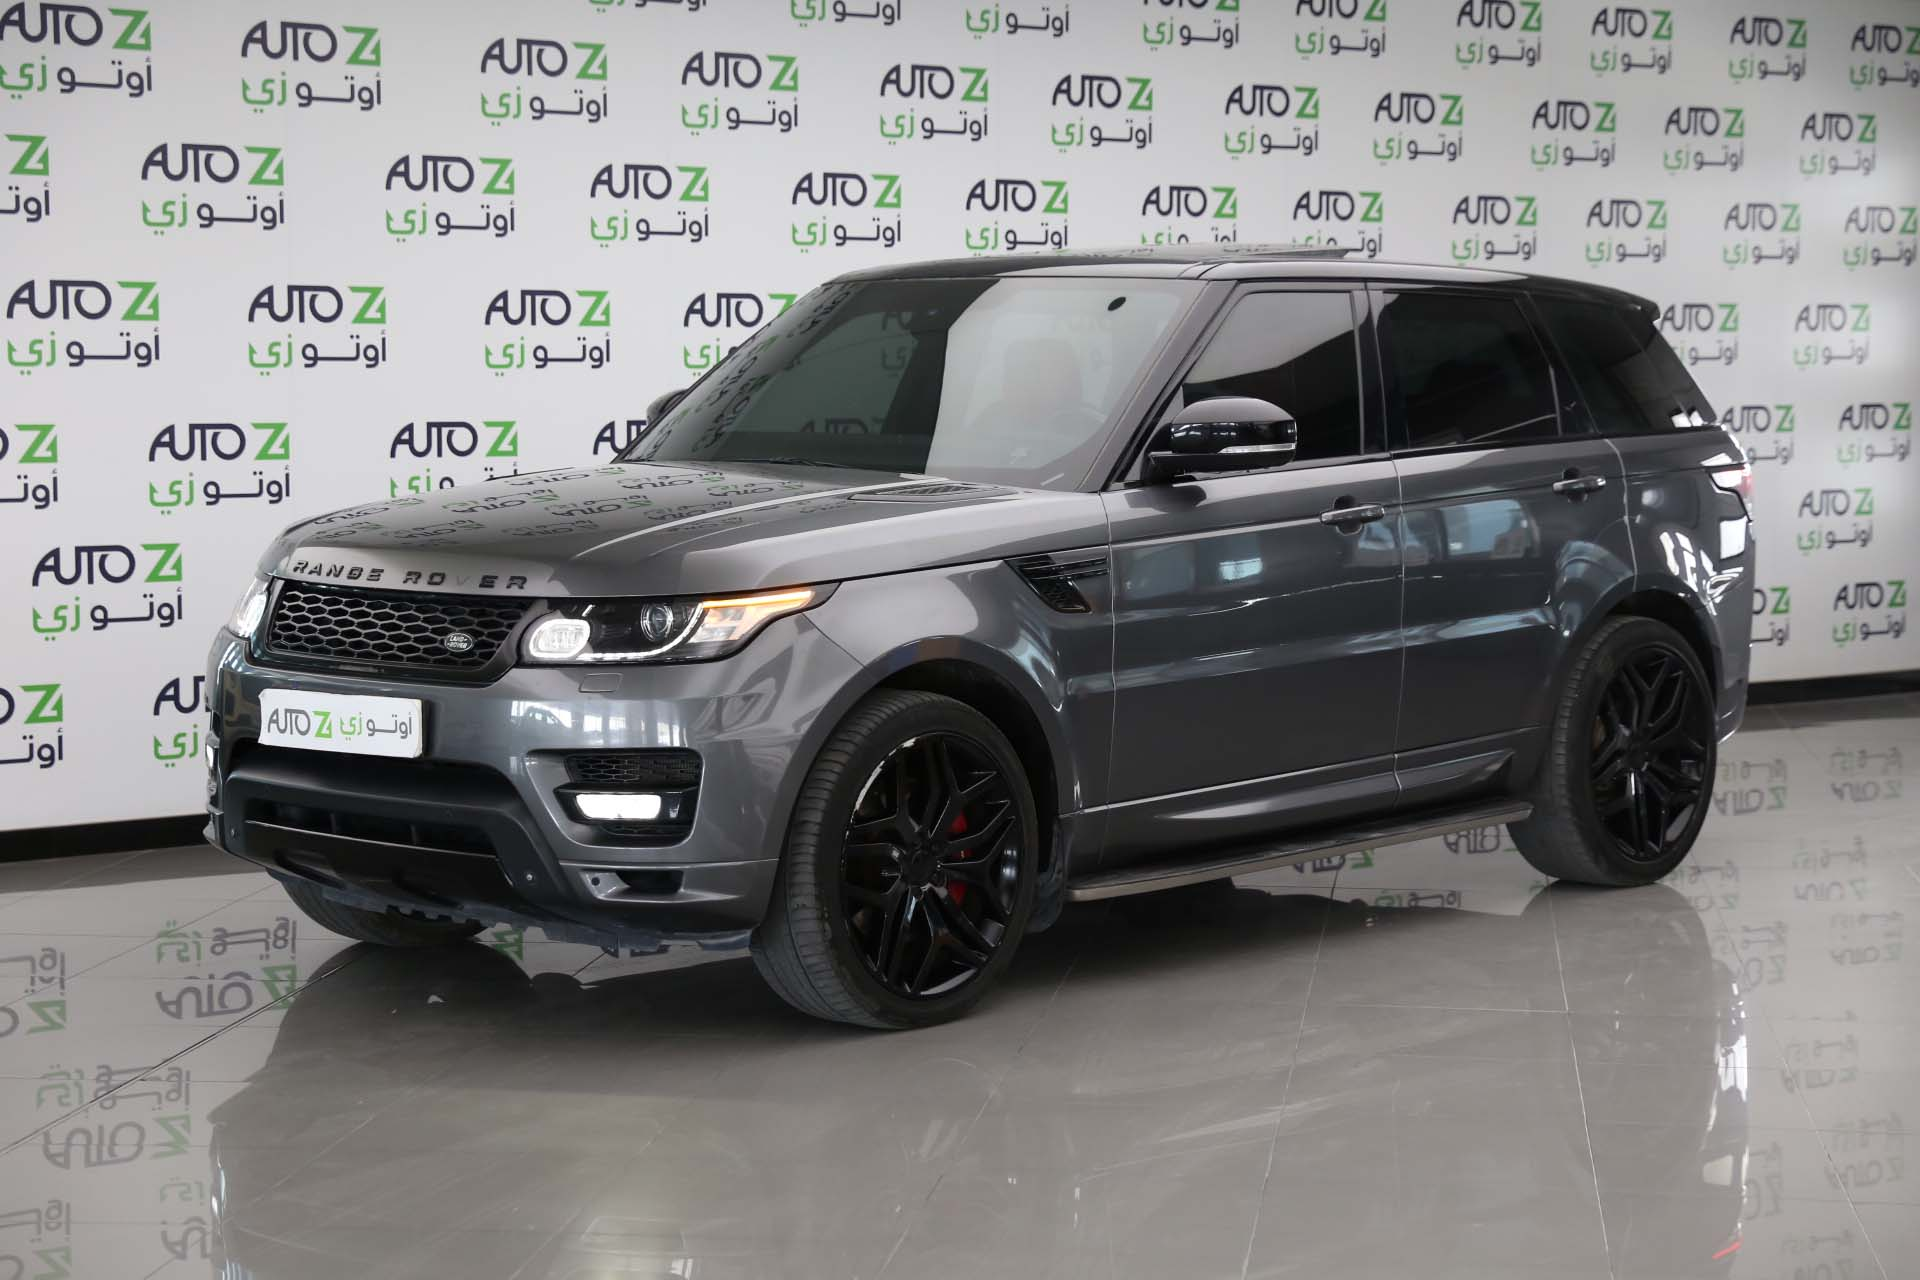 Range—Rover -Sport 2014